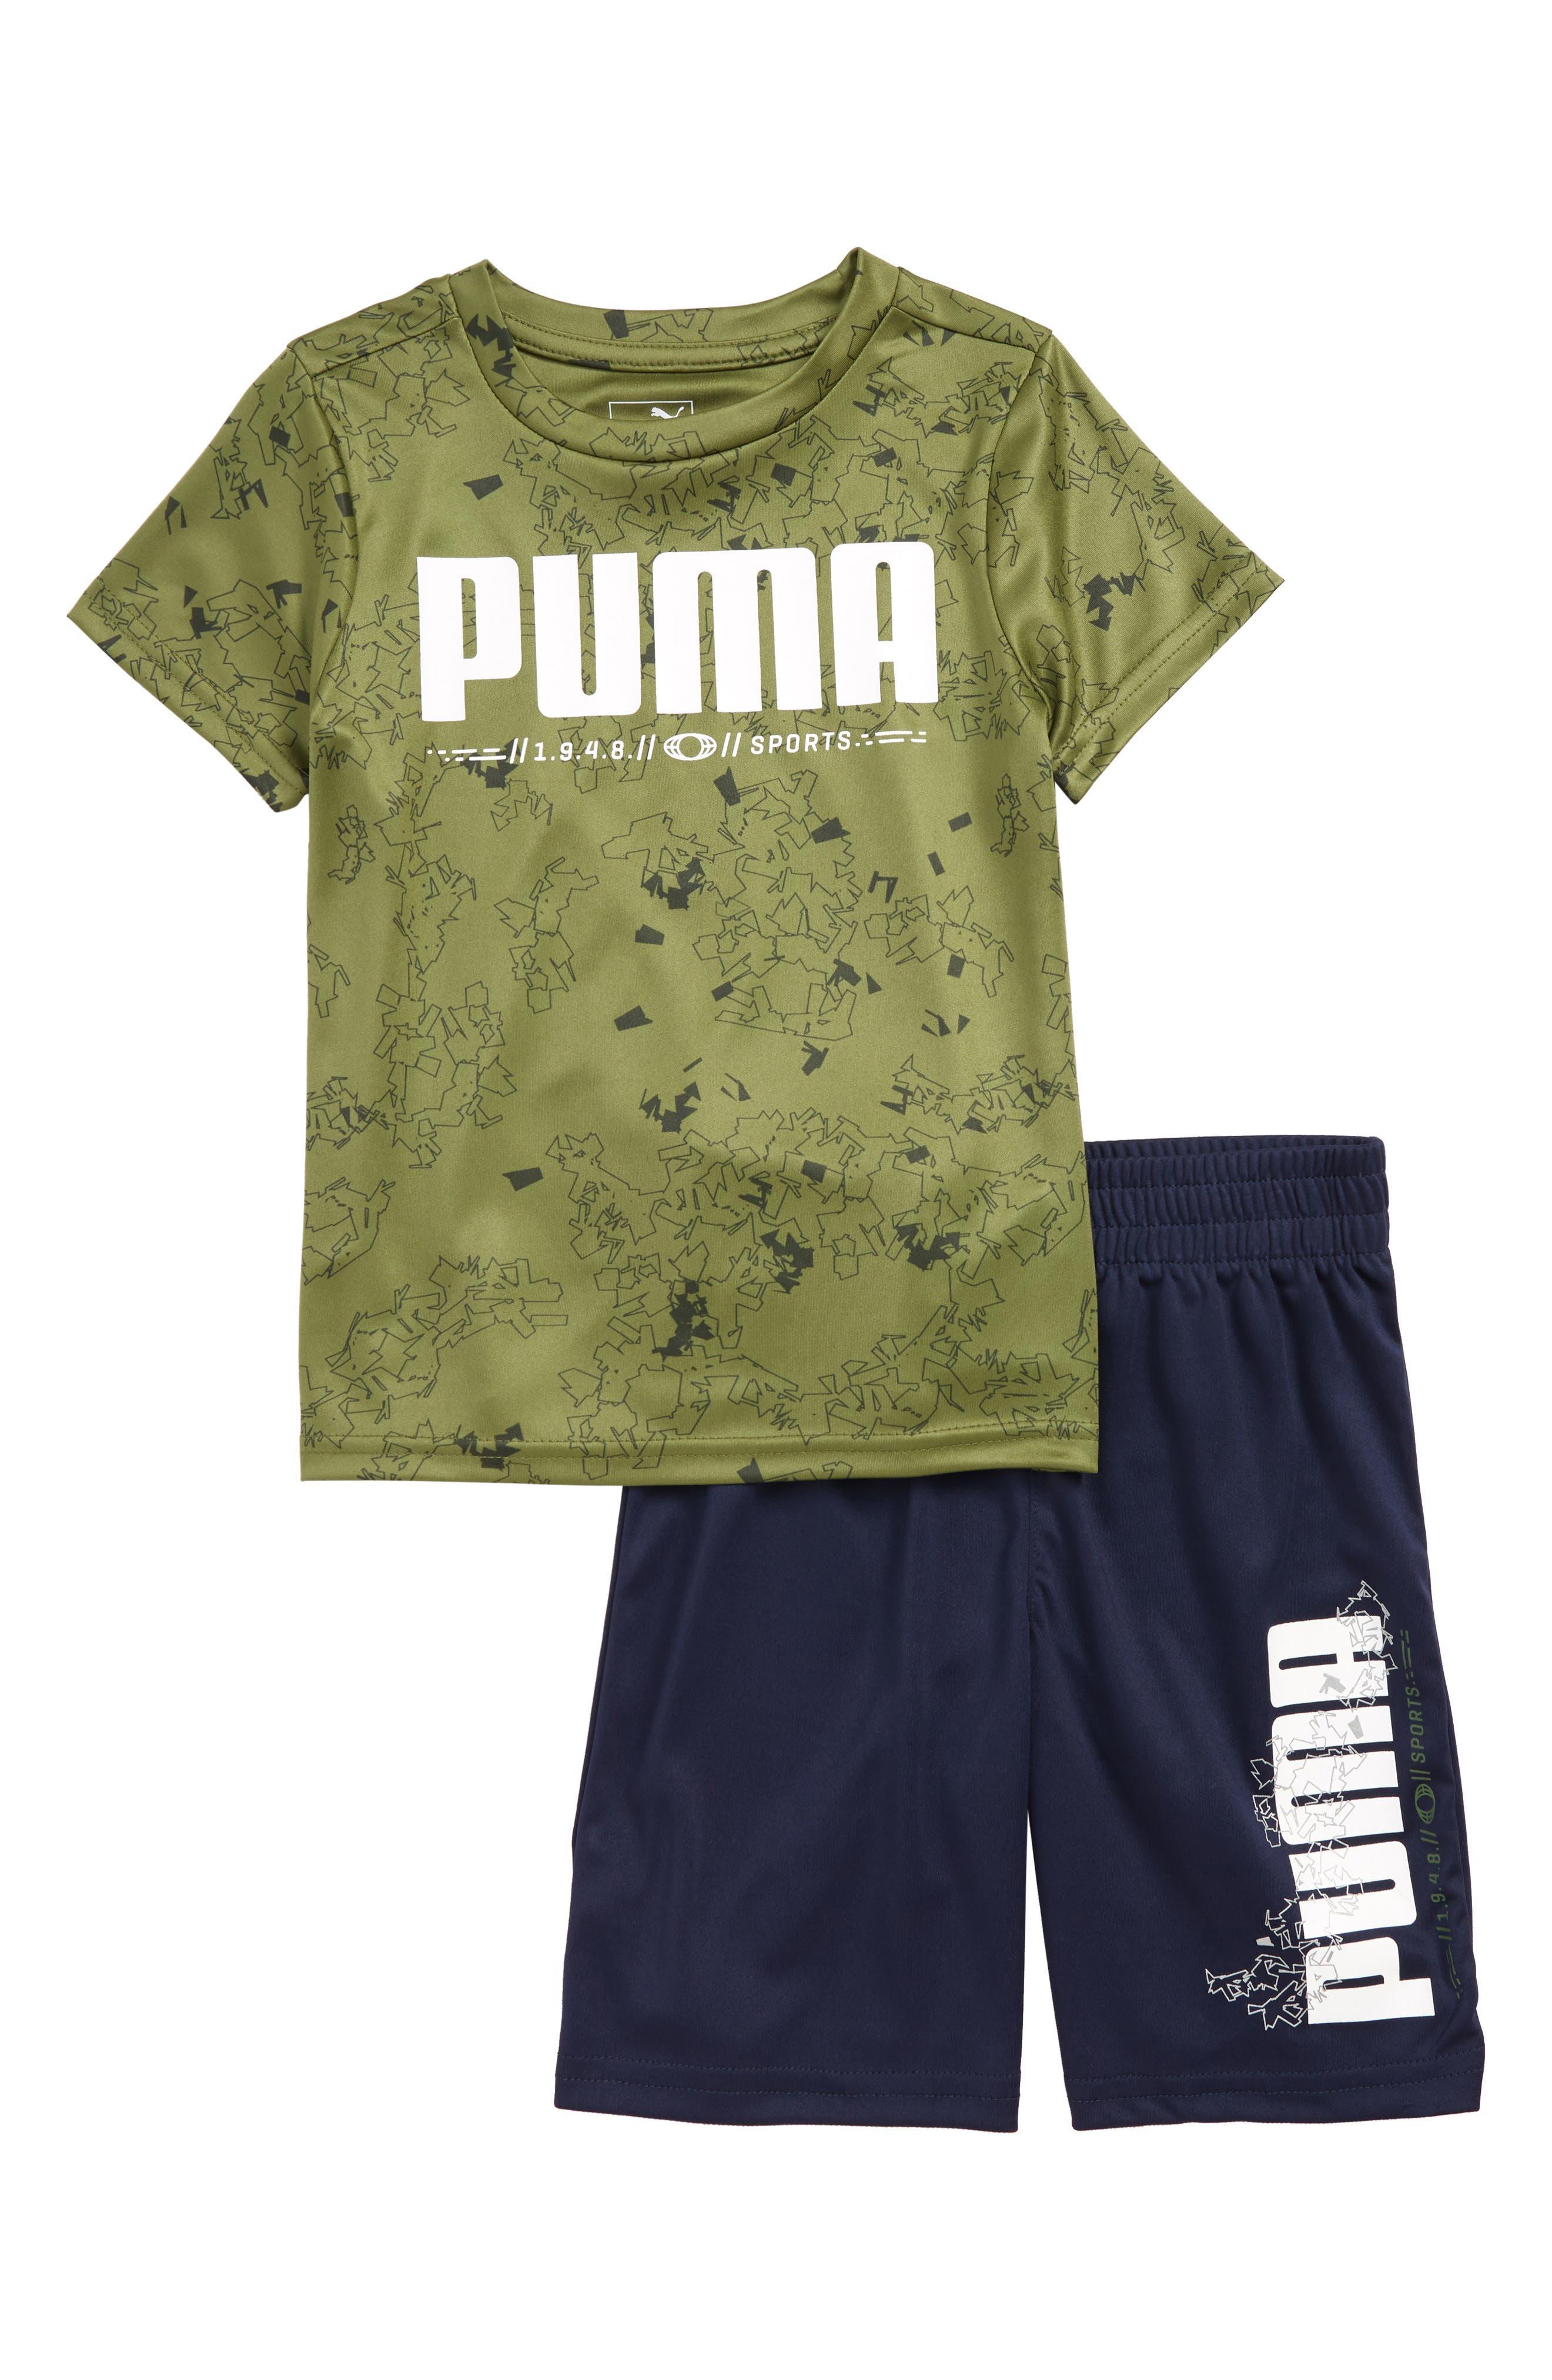 Toddler Boys Puma Logo Interlock Performance TShirt  Shorts Set